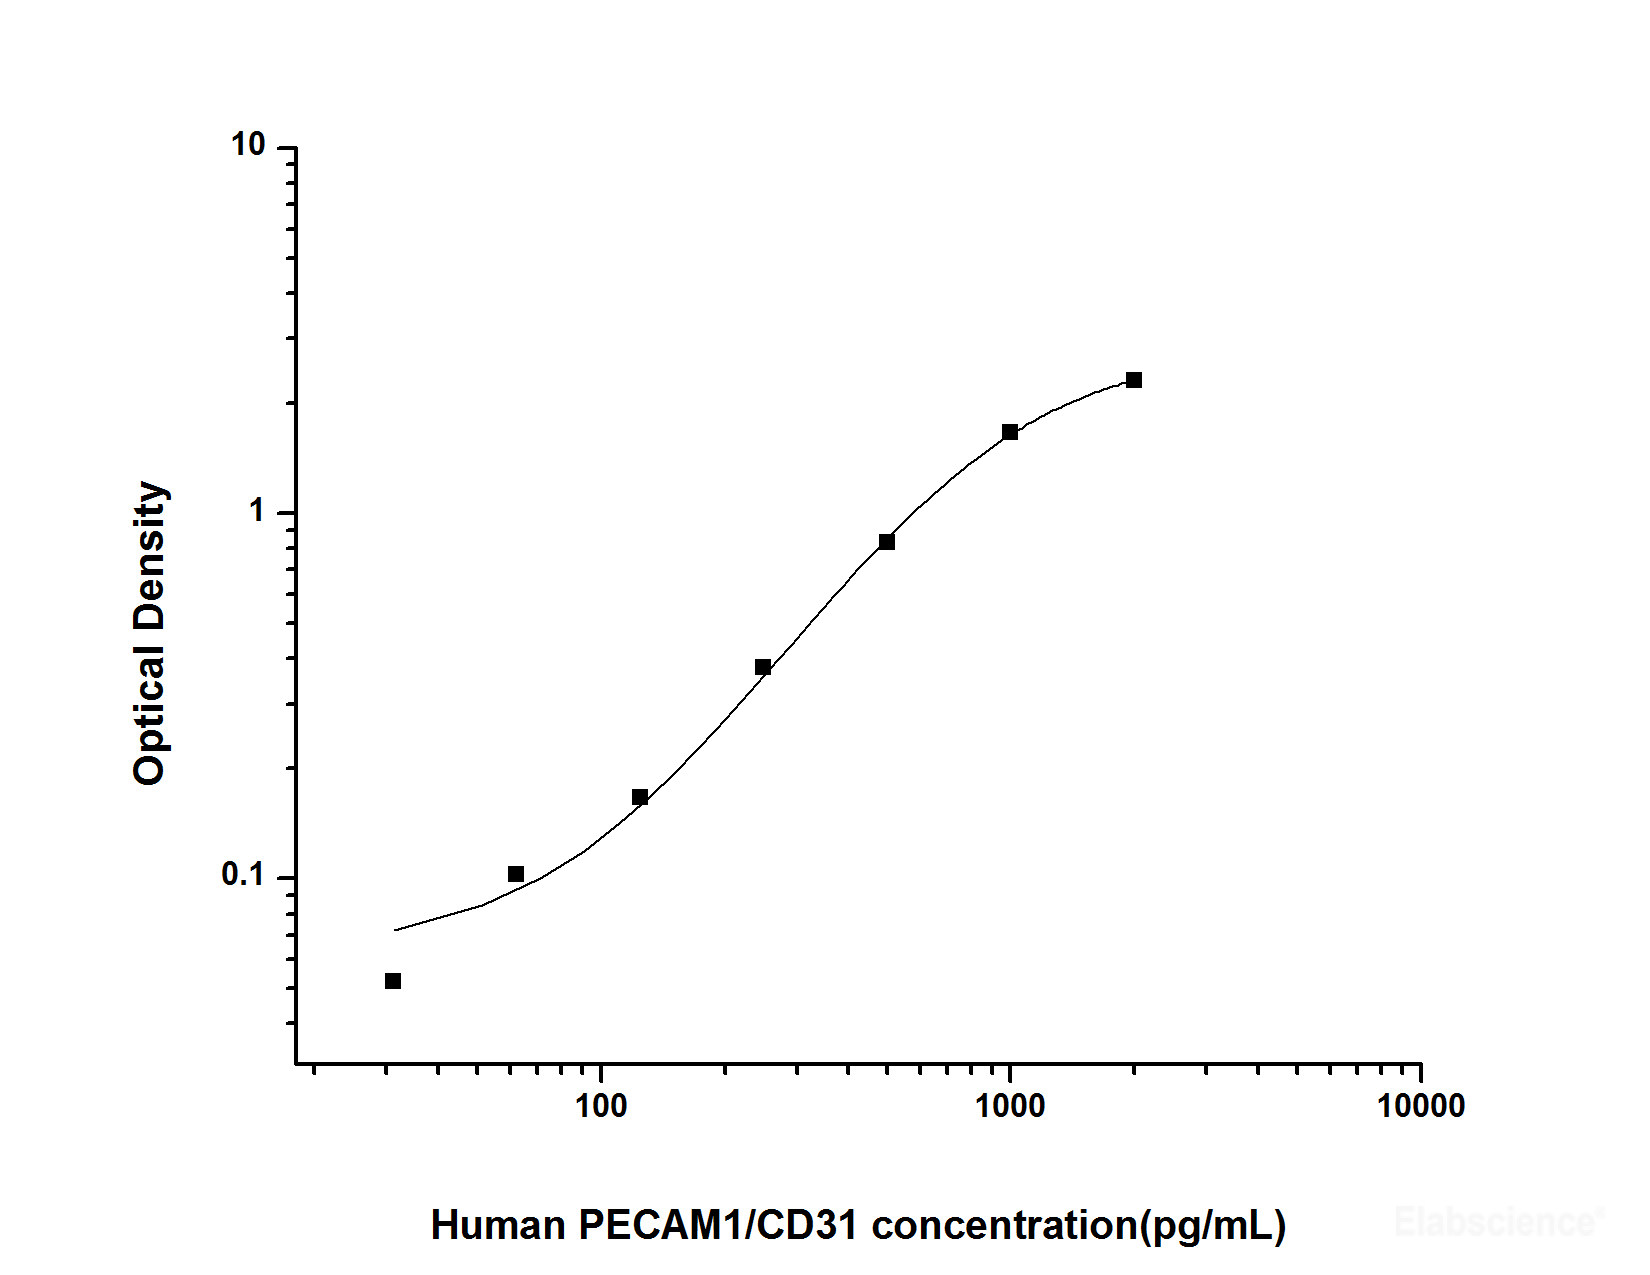 Buy Human PECAM1/CD31(Platelet/Endothelial Cell Adhesion Molecule 1) ELISA  Kit E-EL-H1640 Online at Elabscience.com